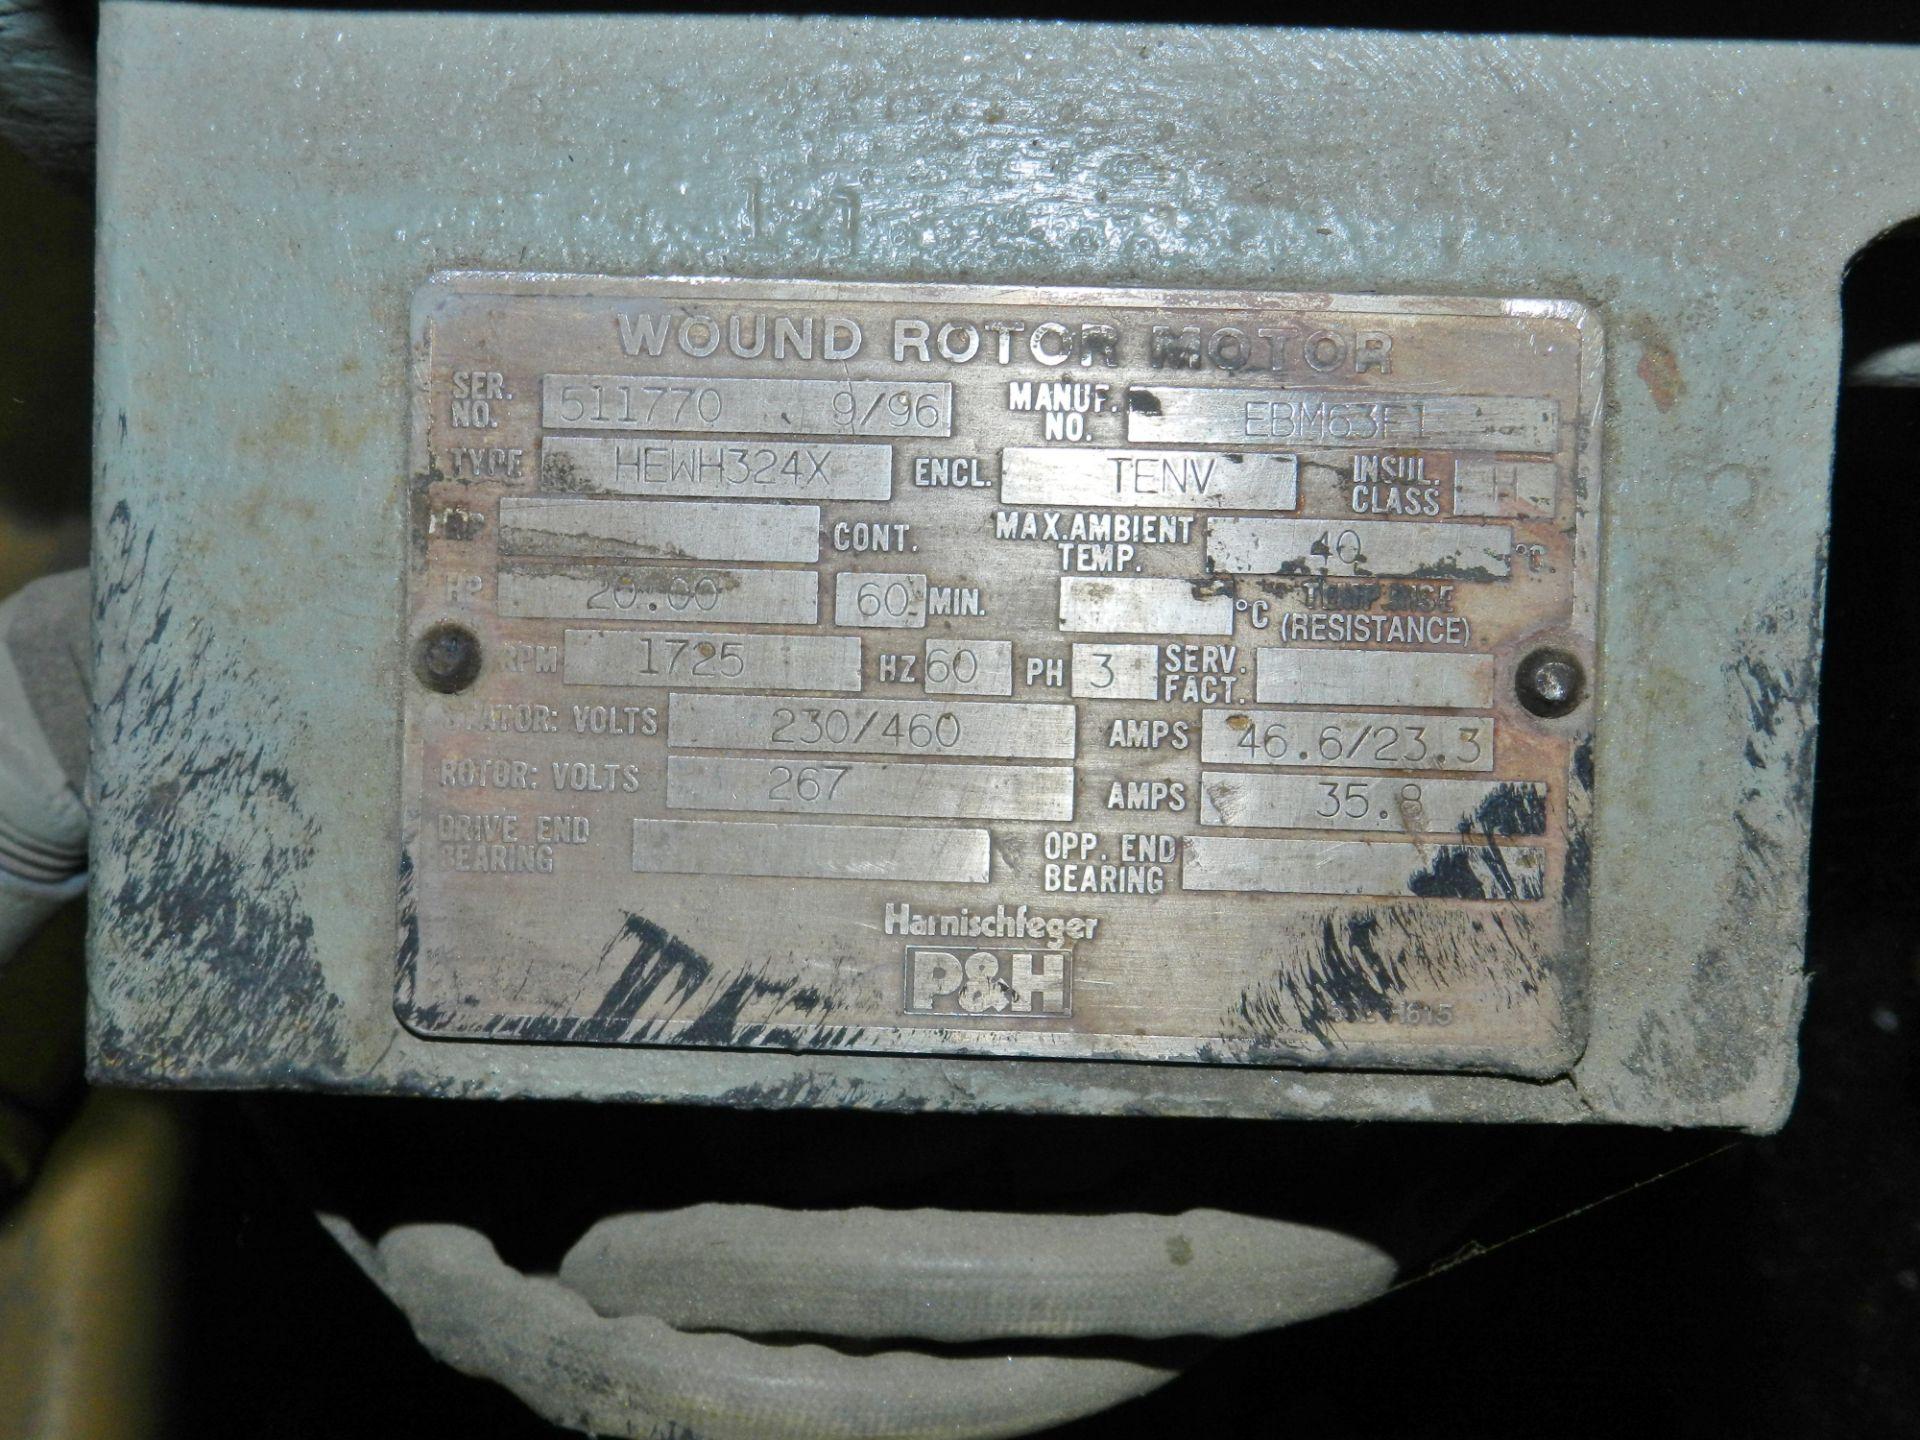 Lot 42 - P & H 5 Ton Hoist N44EJ43G